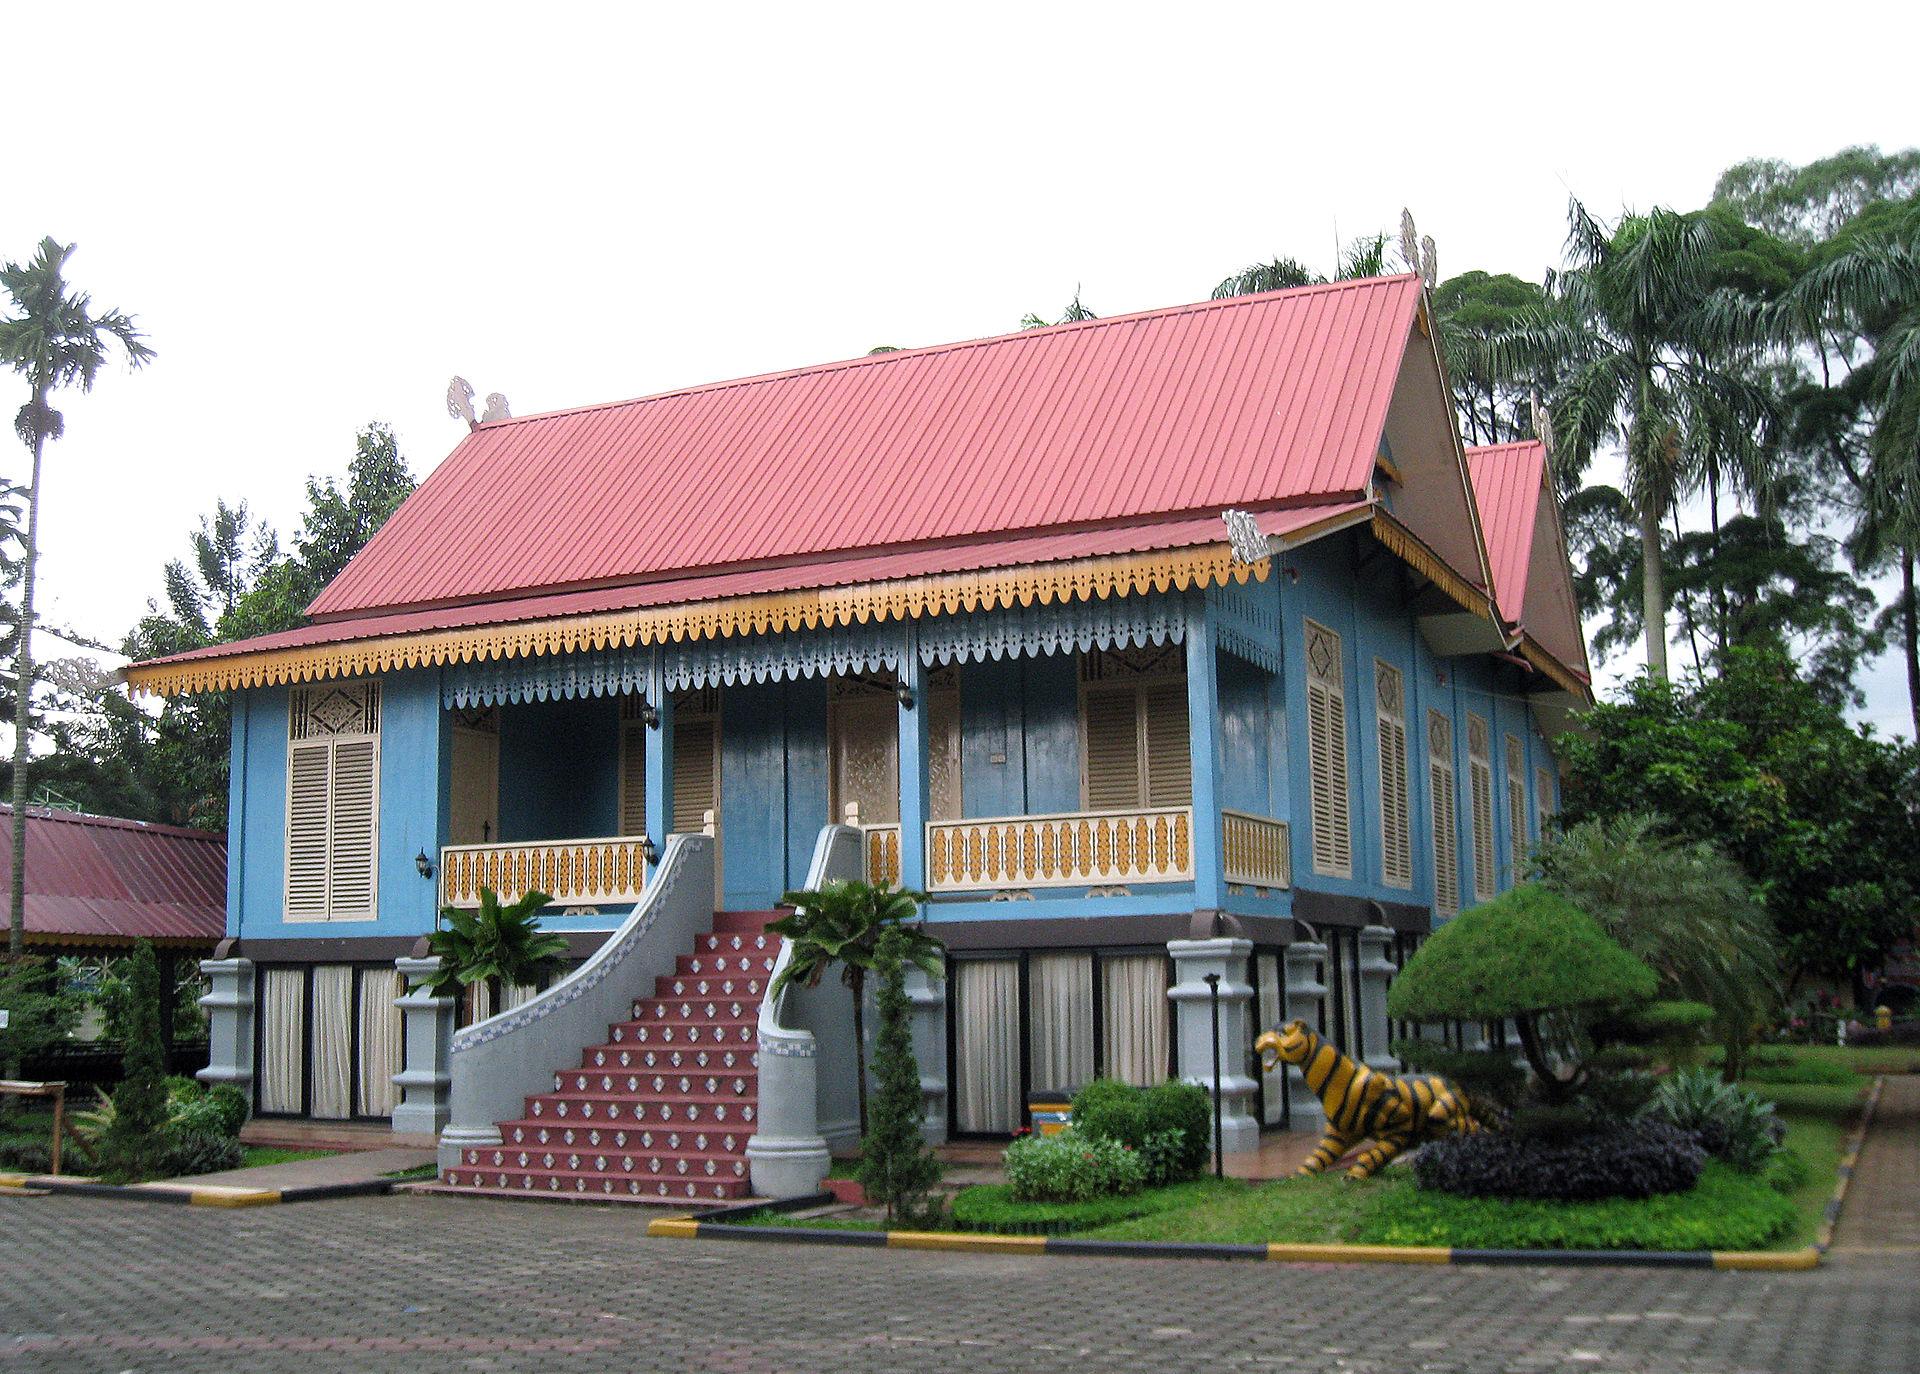 Budaya Kepulauan Riau - Wikipedia bahasa Indonesia